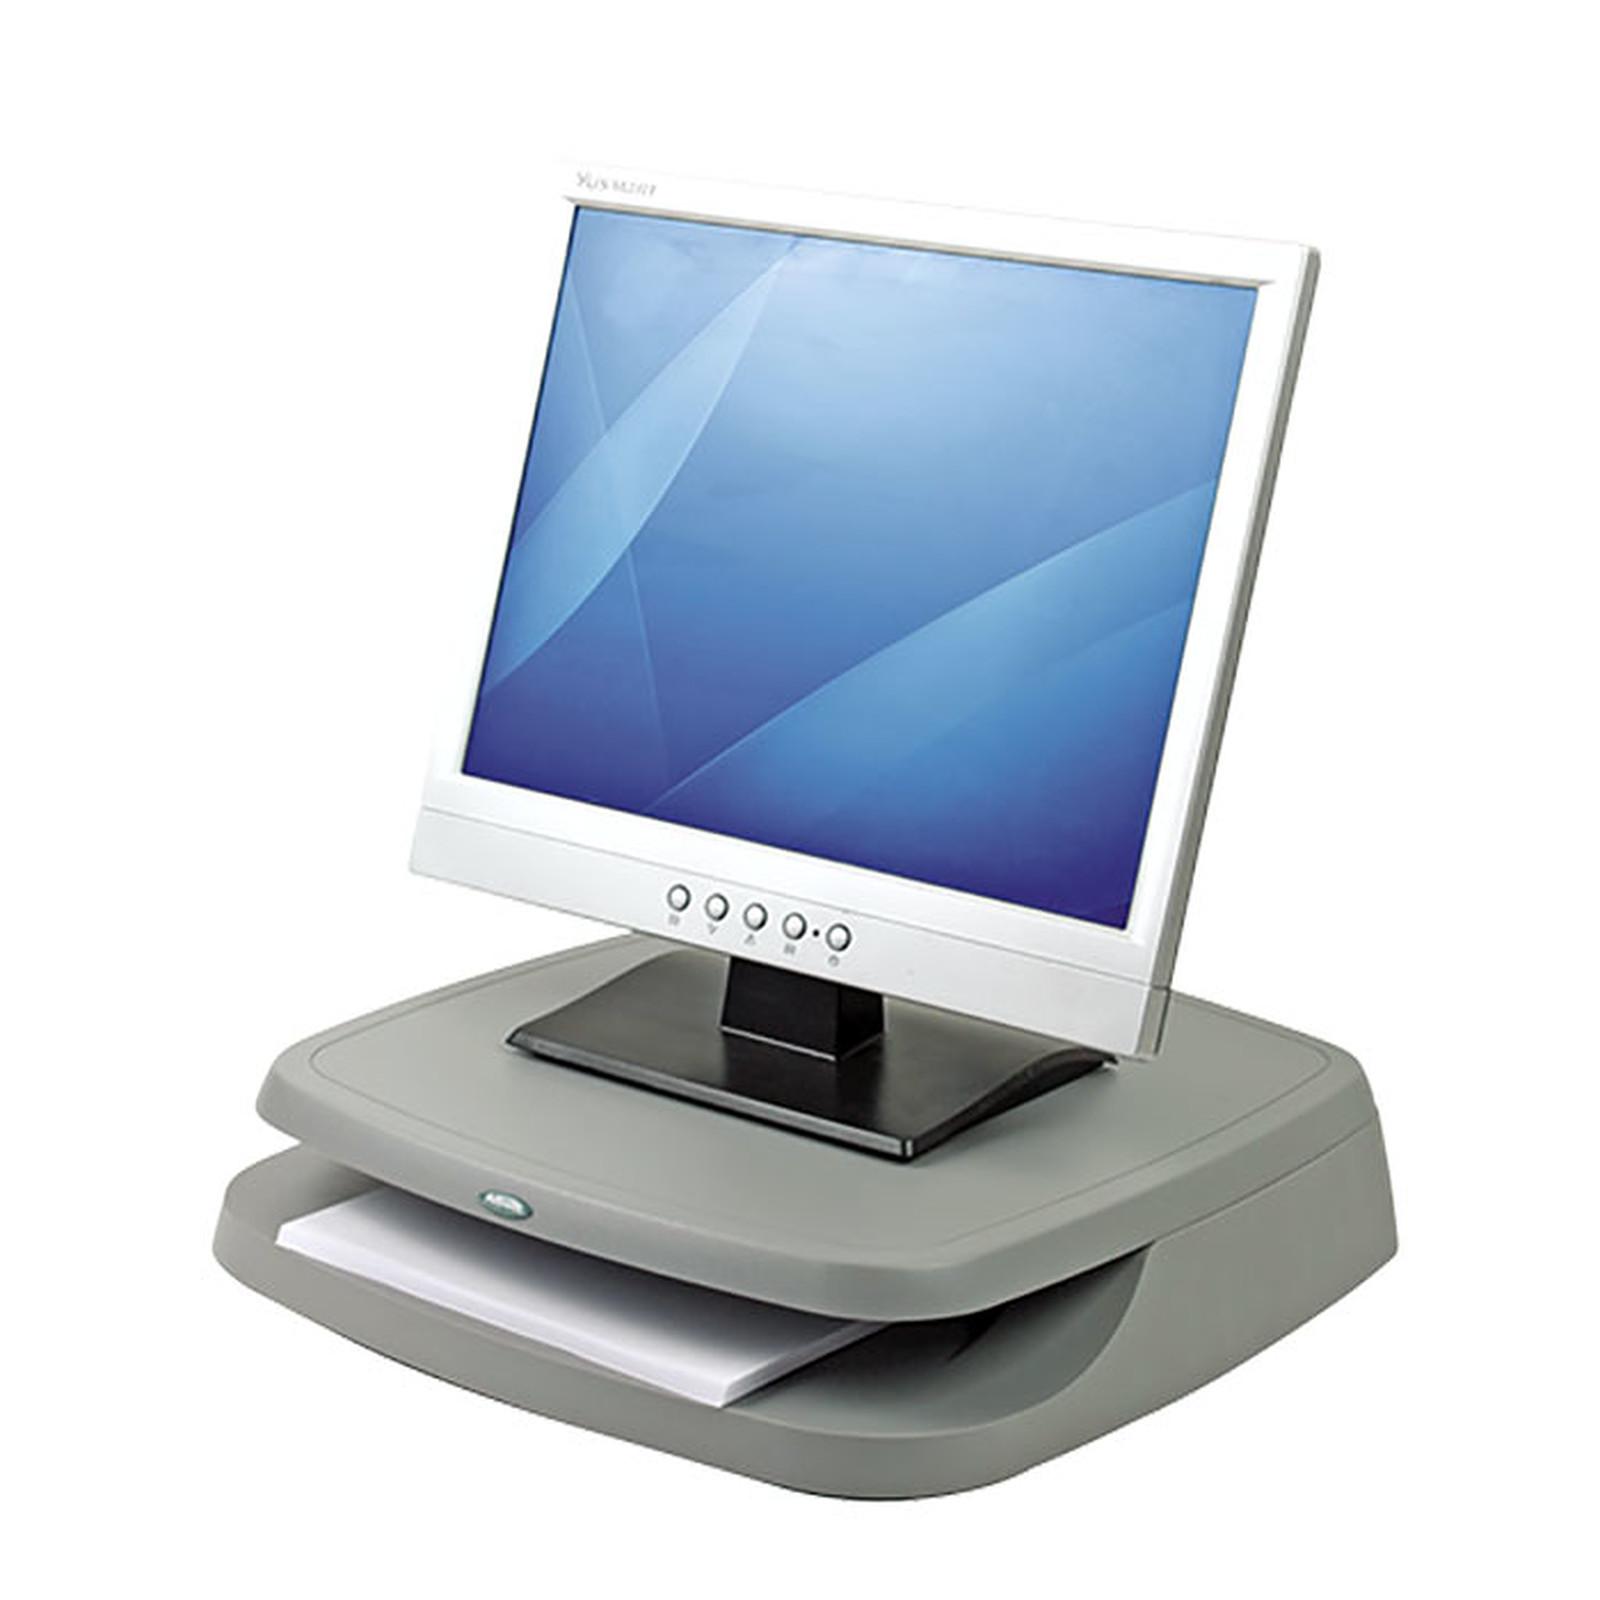 Fellowes Support moniteur TFT/LCD